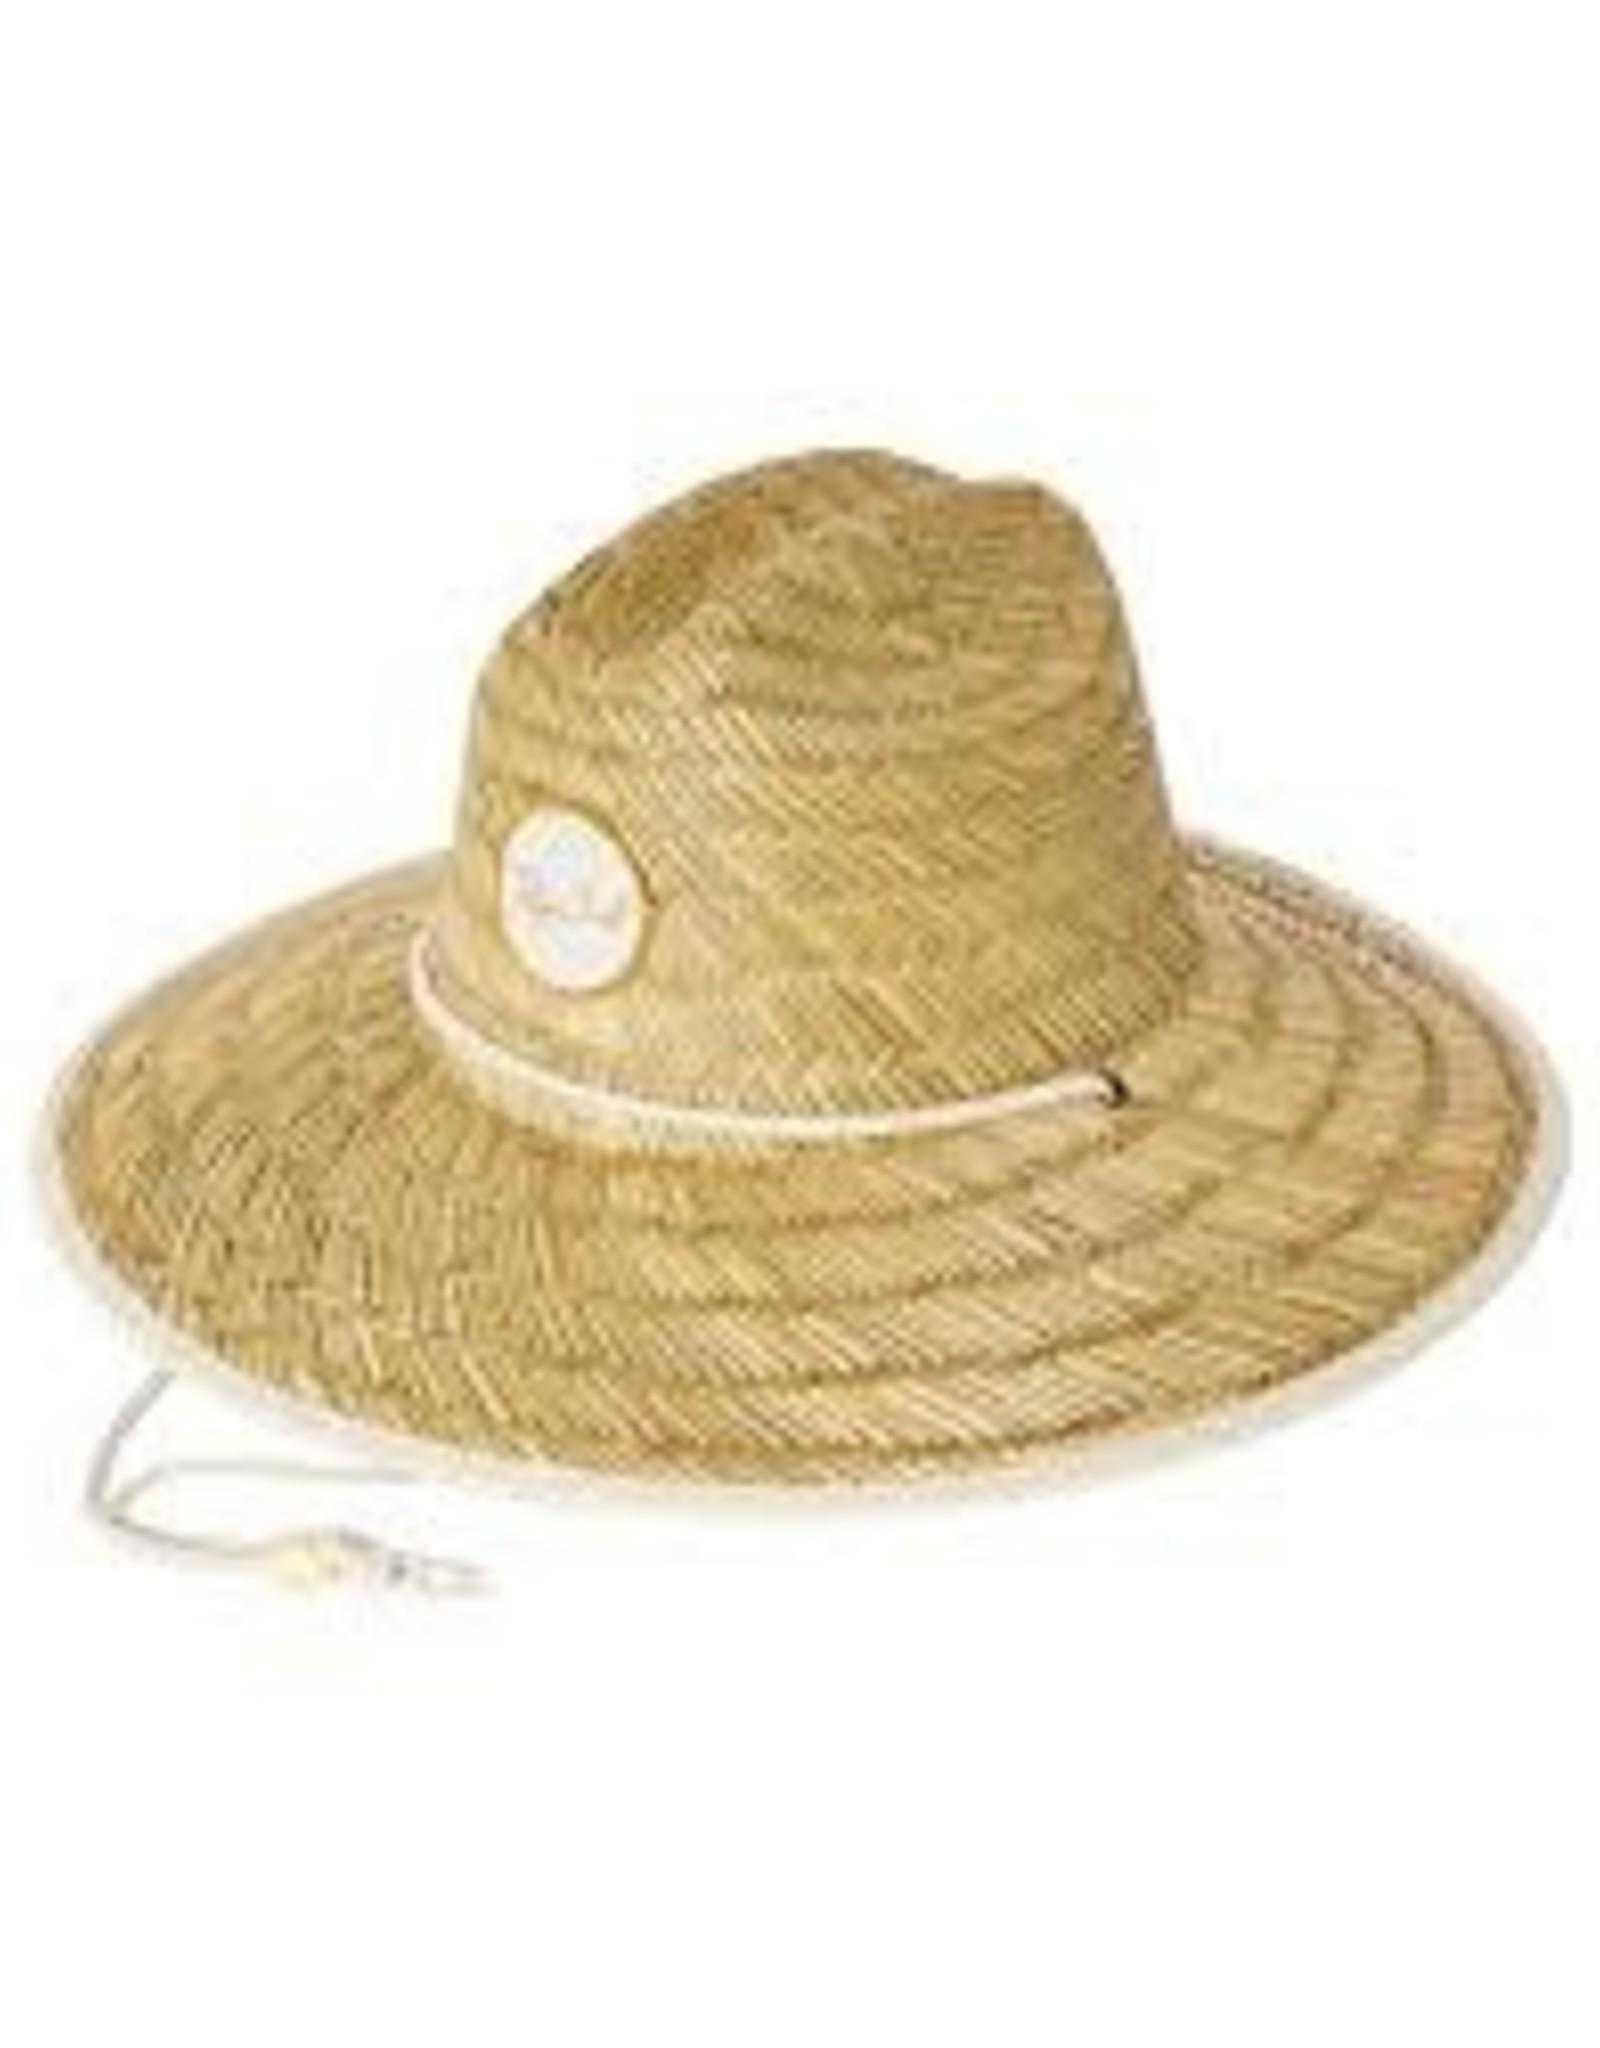 rip curl rip curl script straw sun hat